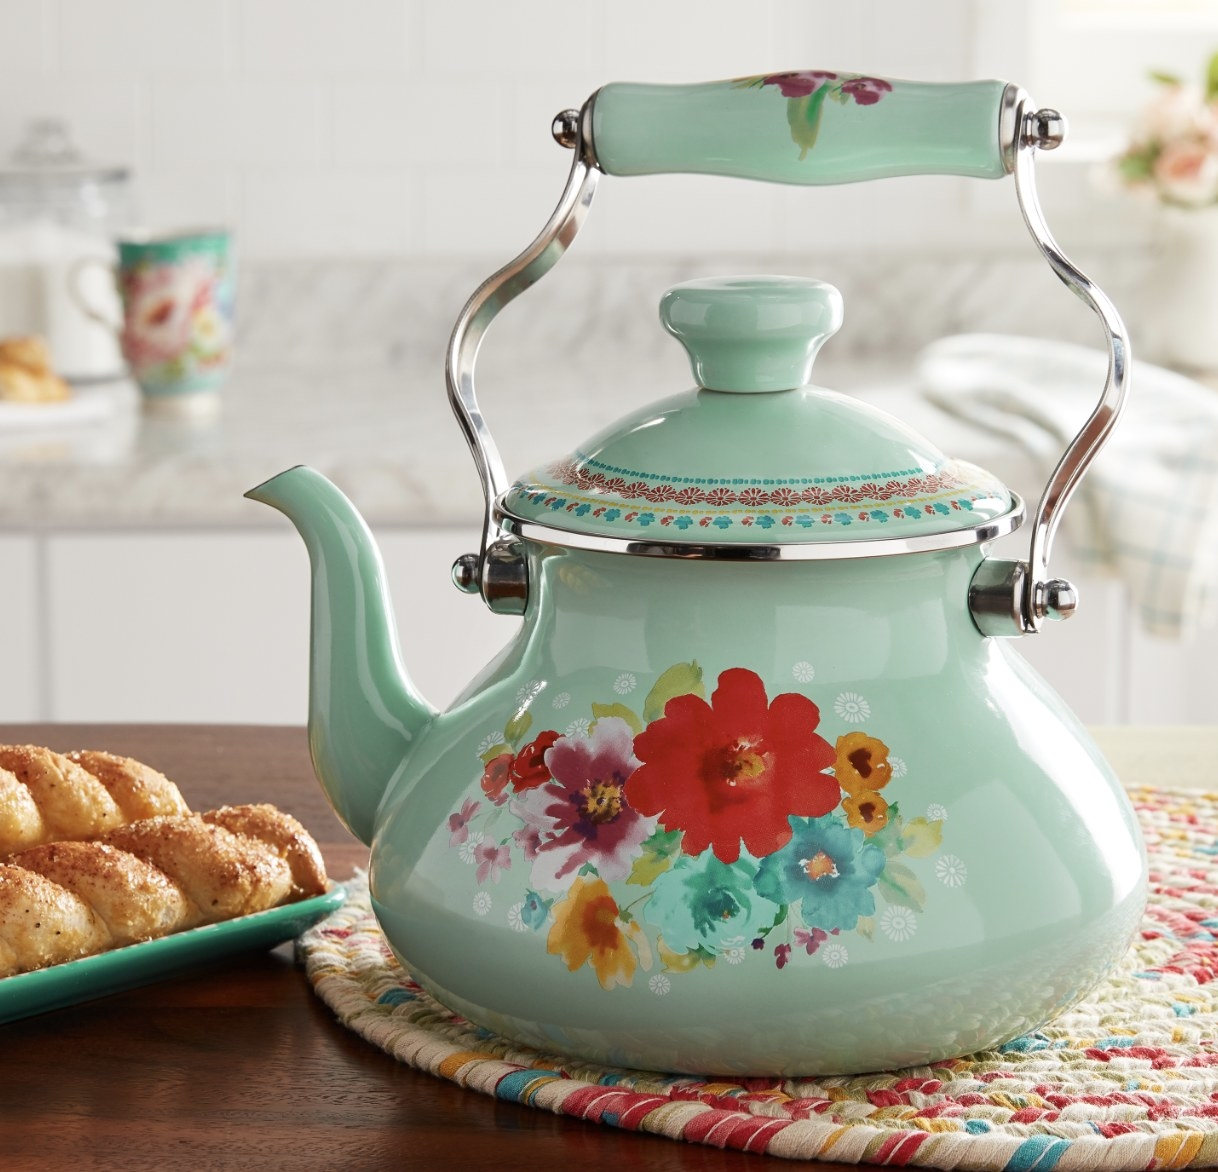 A light blue tea kettle with a floral design